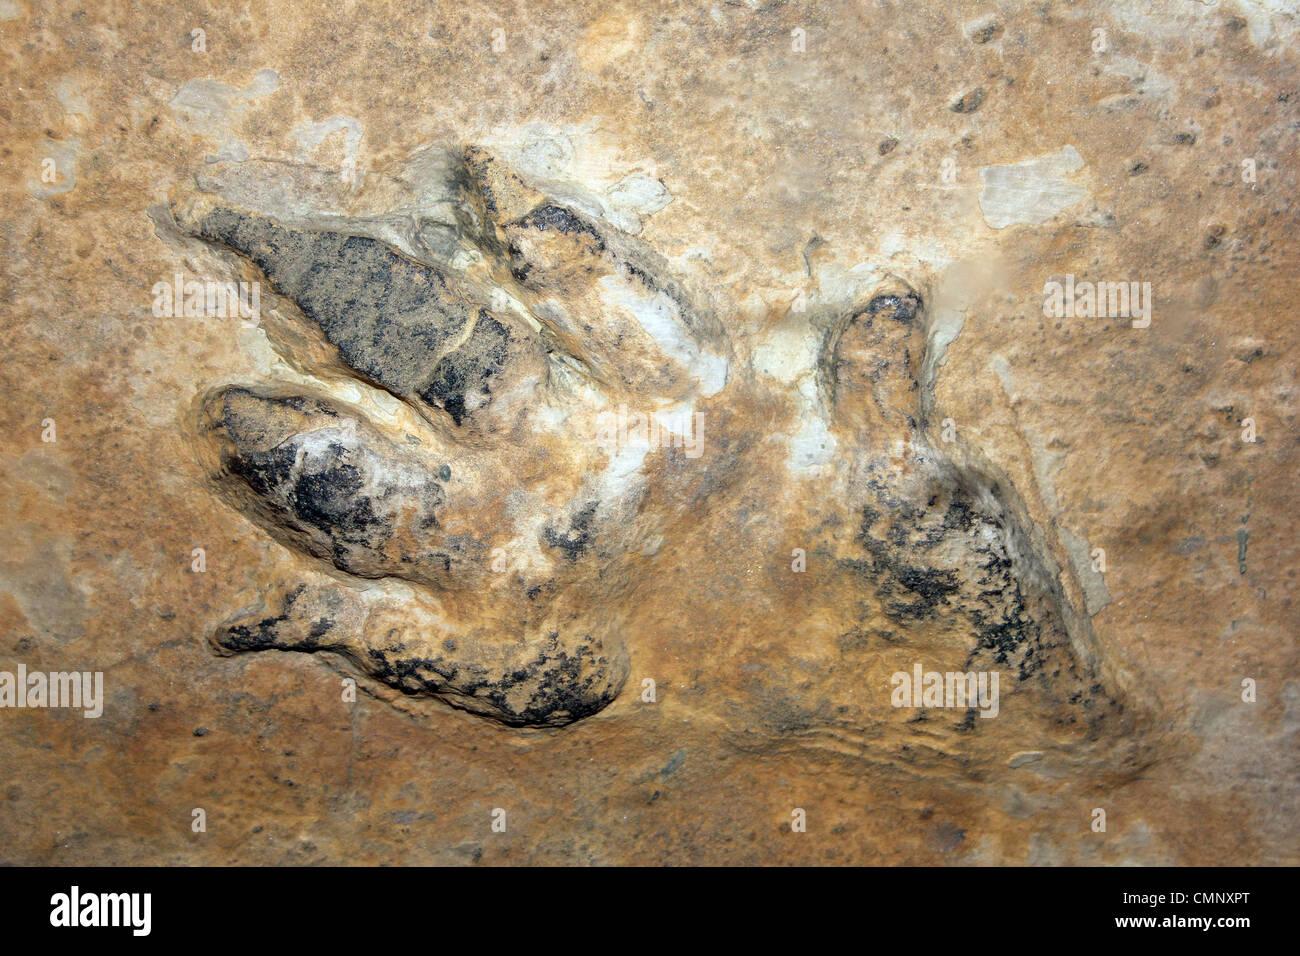 Chirotherium stortonense Footprint in Sandstone - Stock Image